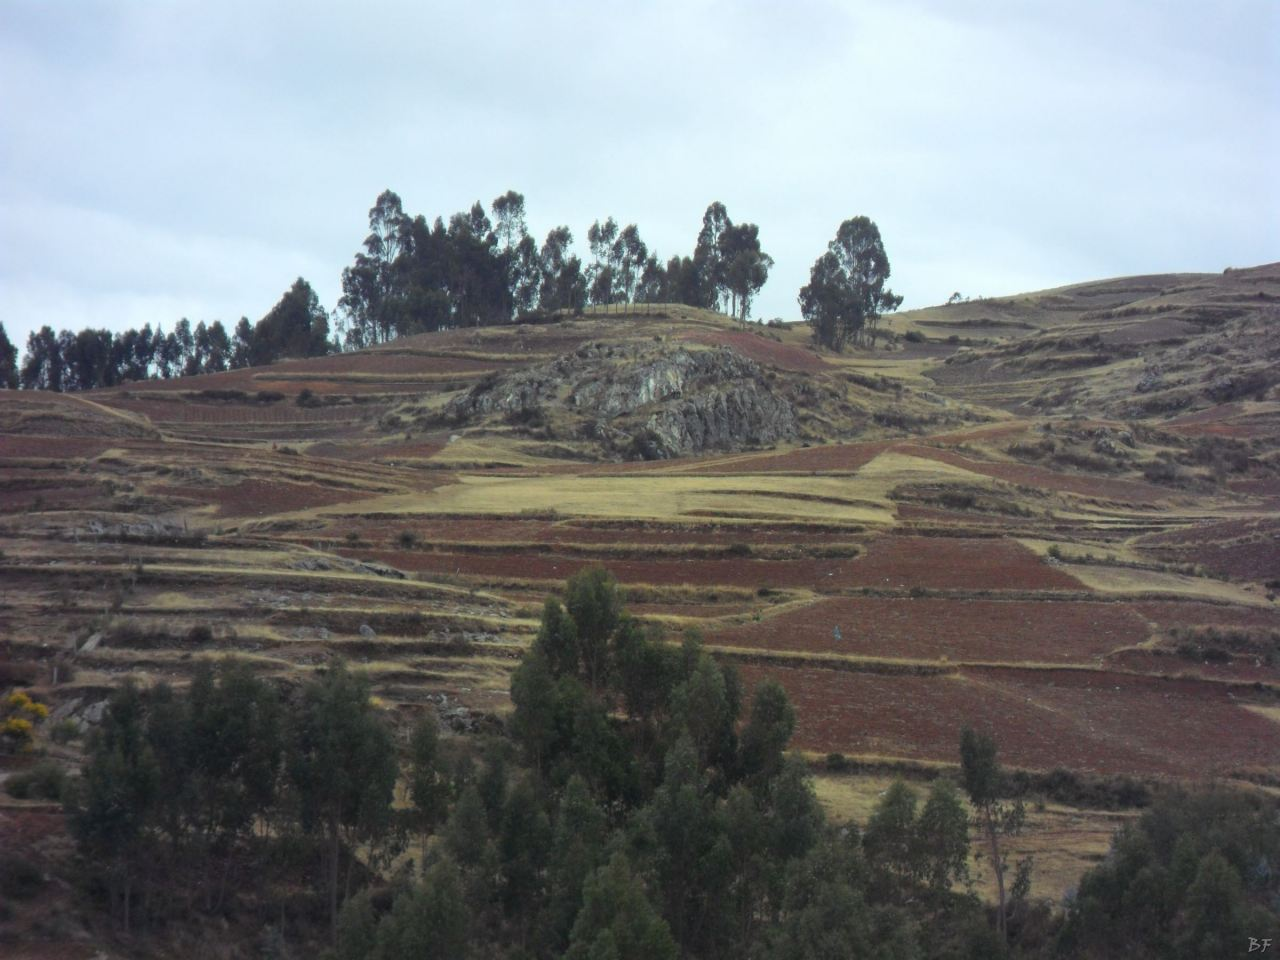 Chinchero-Mura-Poligonali-Piramide-Urubamba-Peru-32